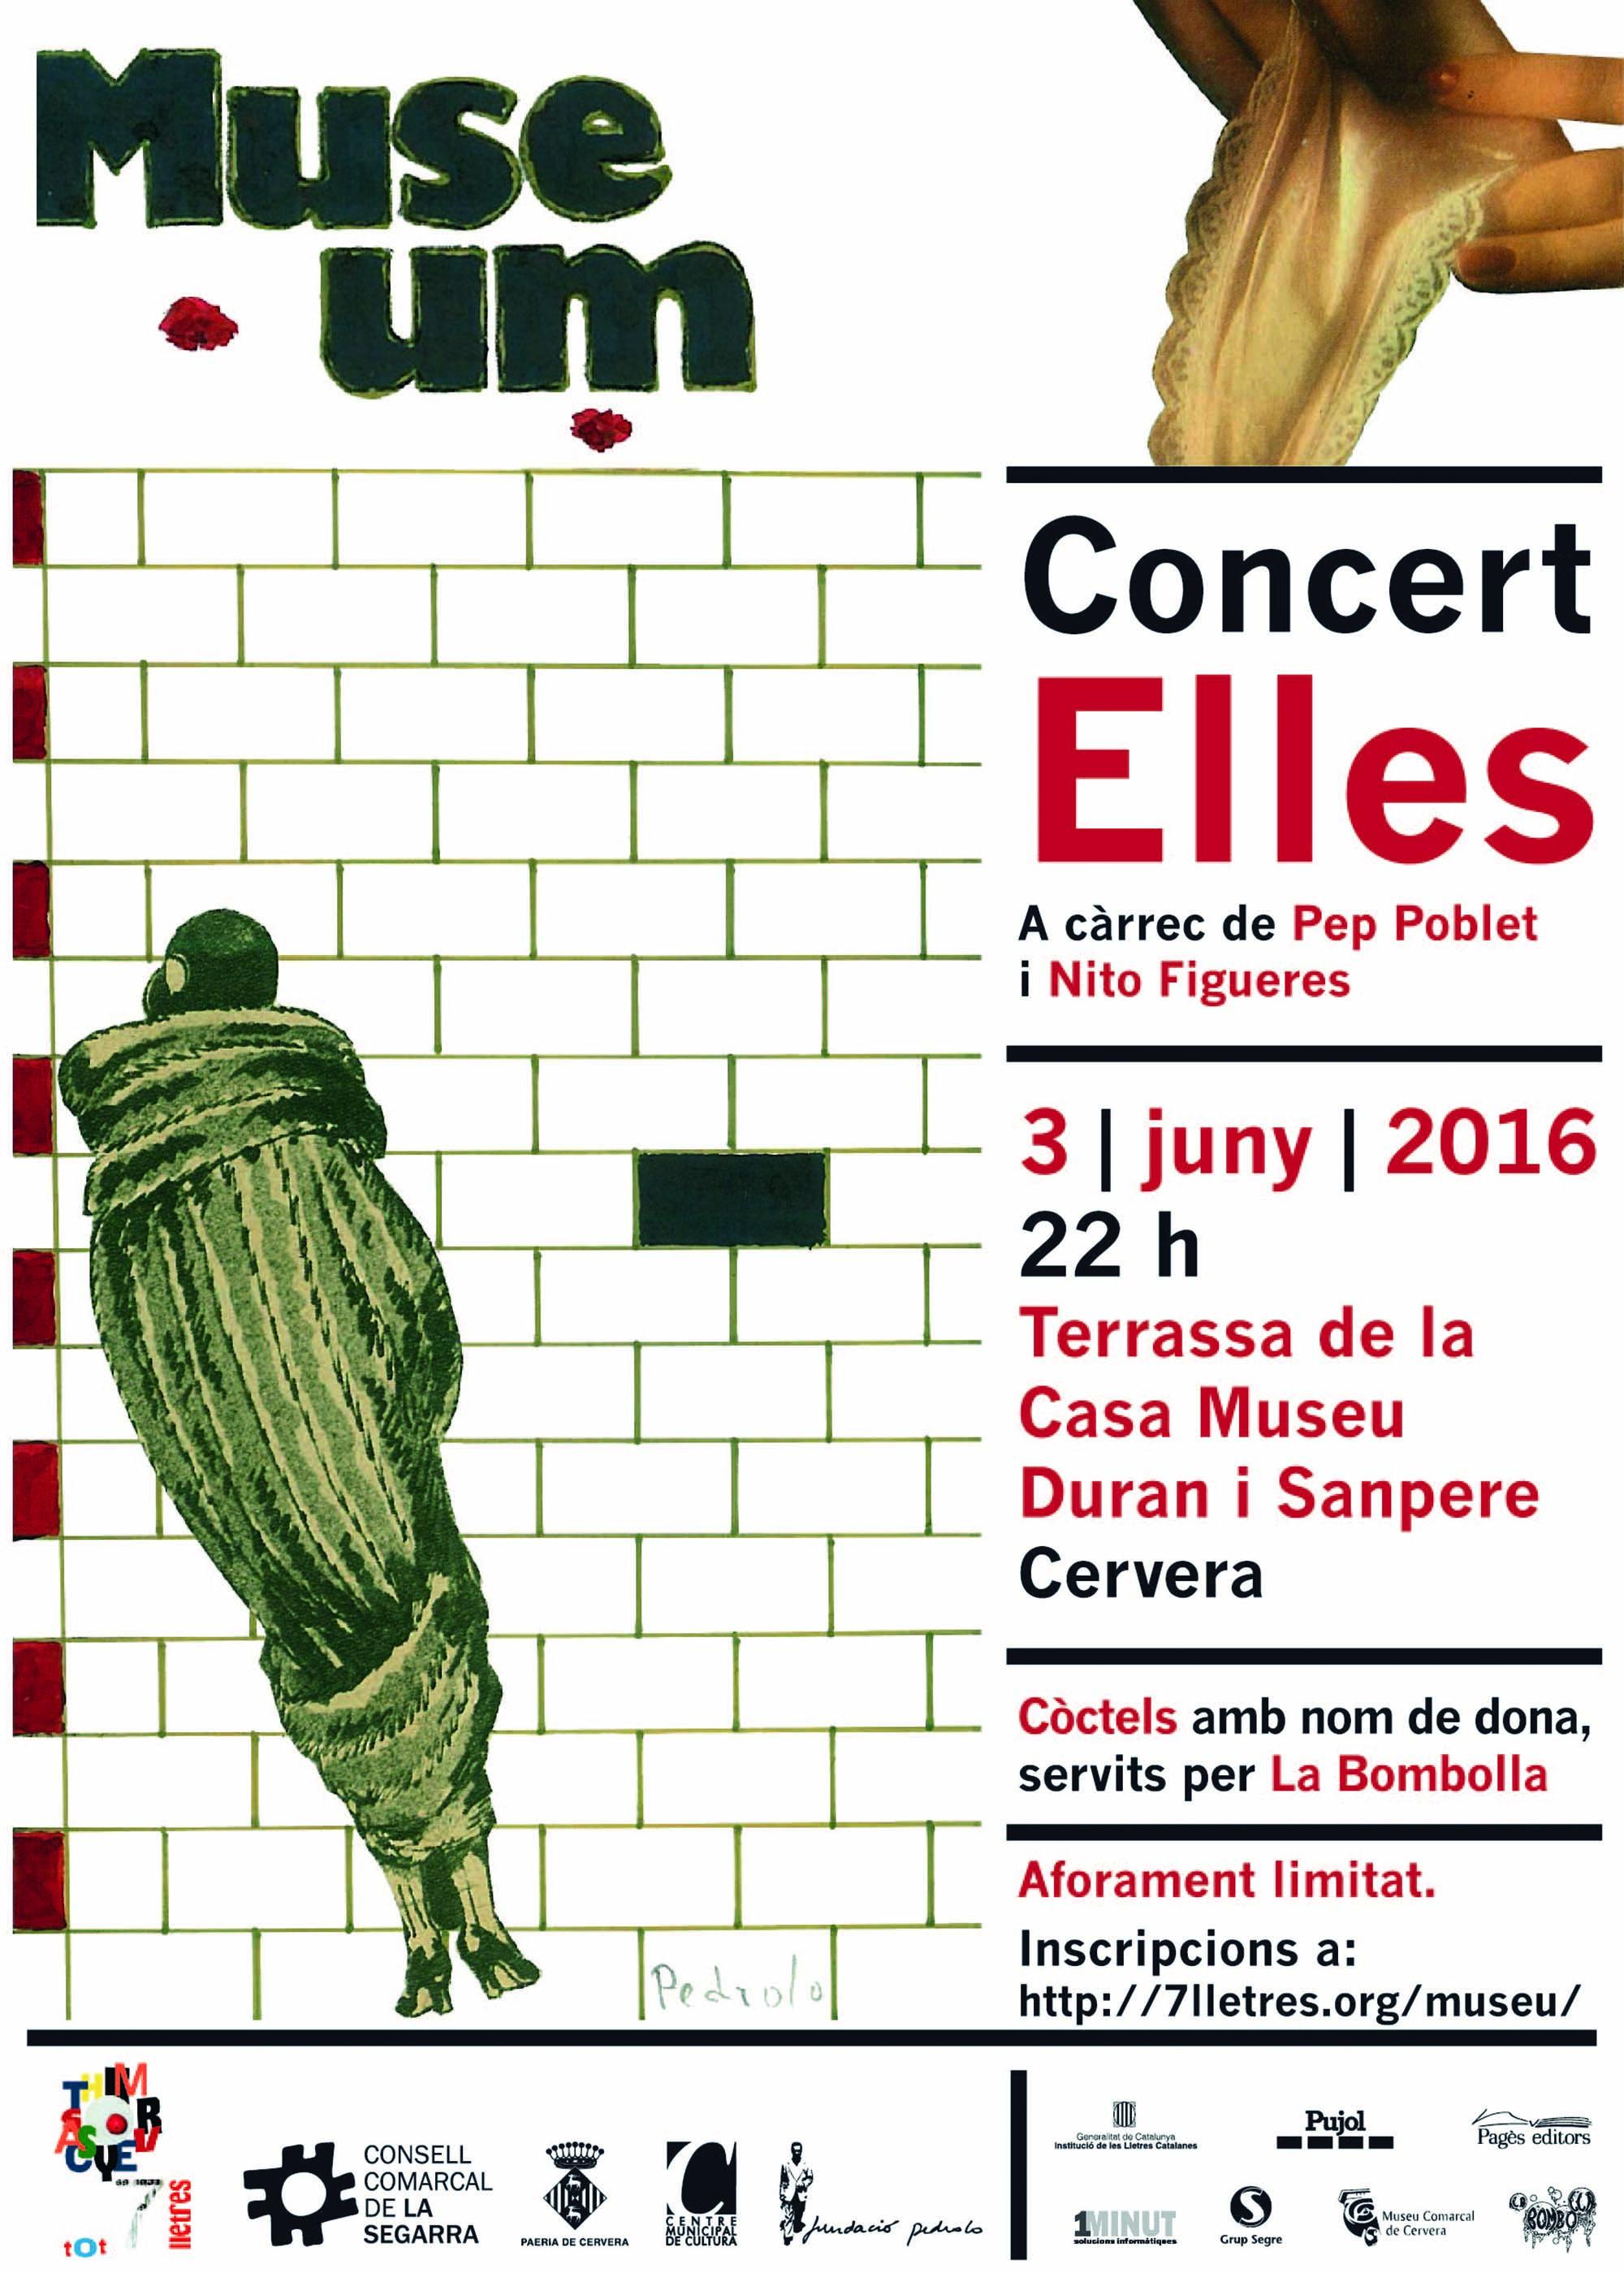 cartell Concert 'Elles'